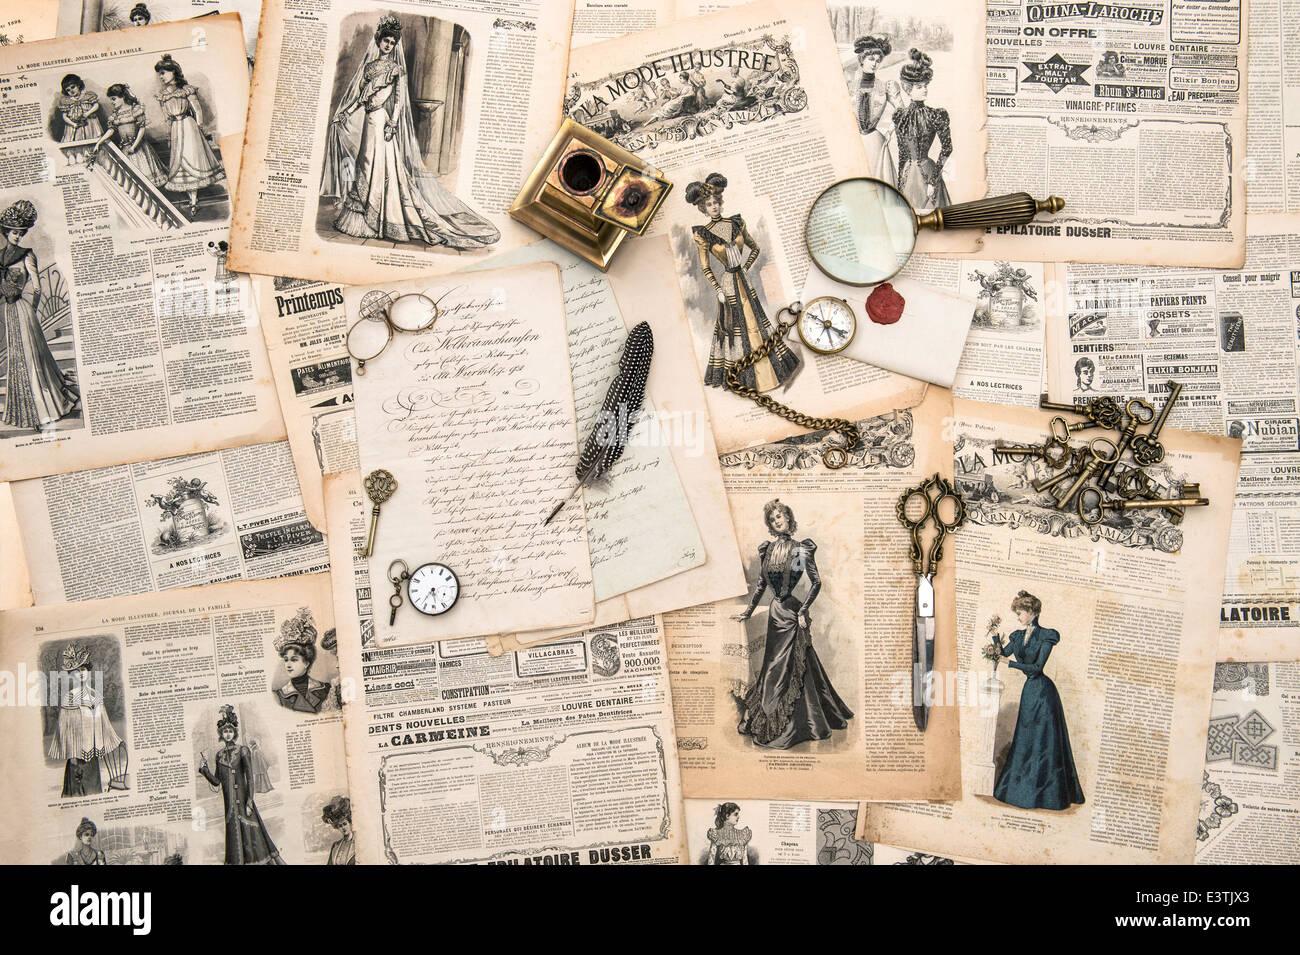 769af175bc antique office accessories